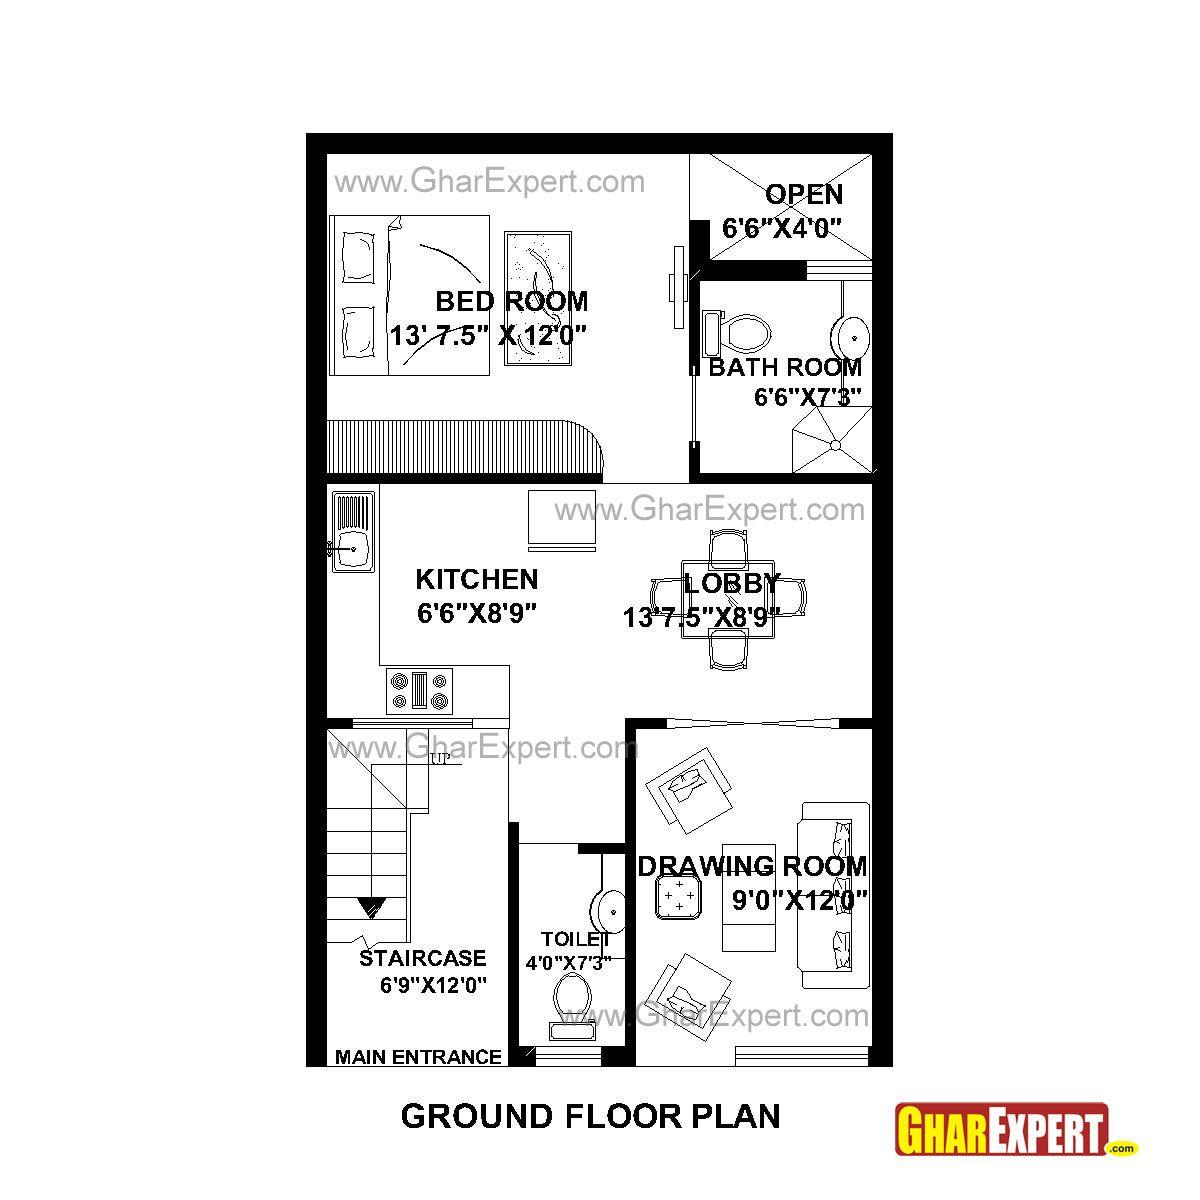 House Plan for 22 Feet by 35 Feet plot (Plot Size 86